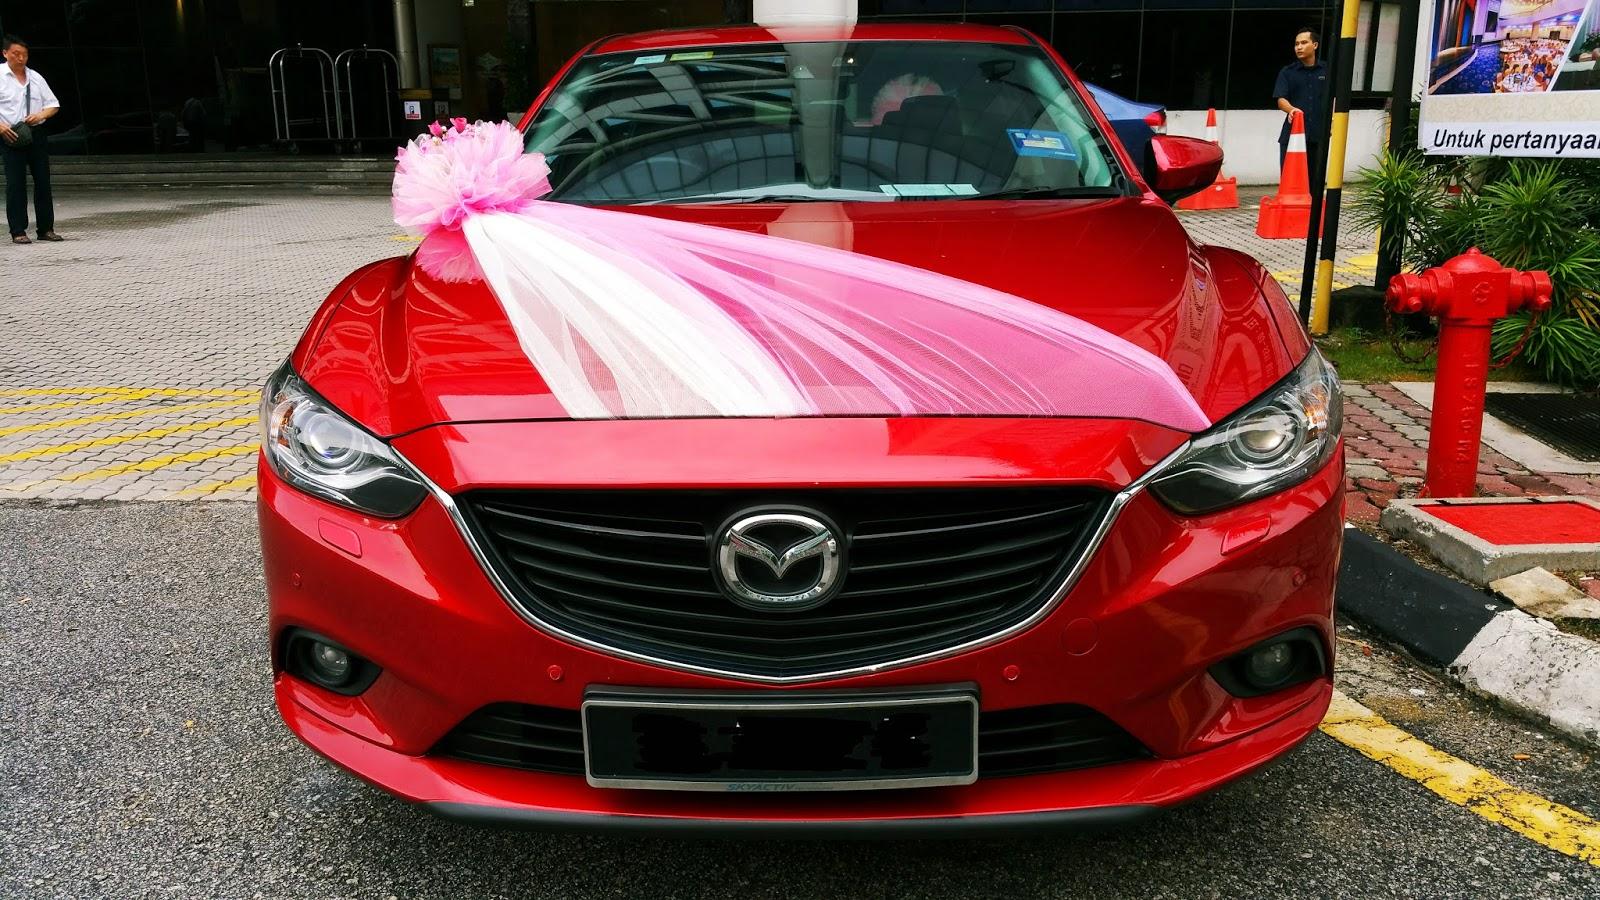 RedOrca Malaysia Wedding and Event Car Rental: Wedding car ...